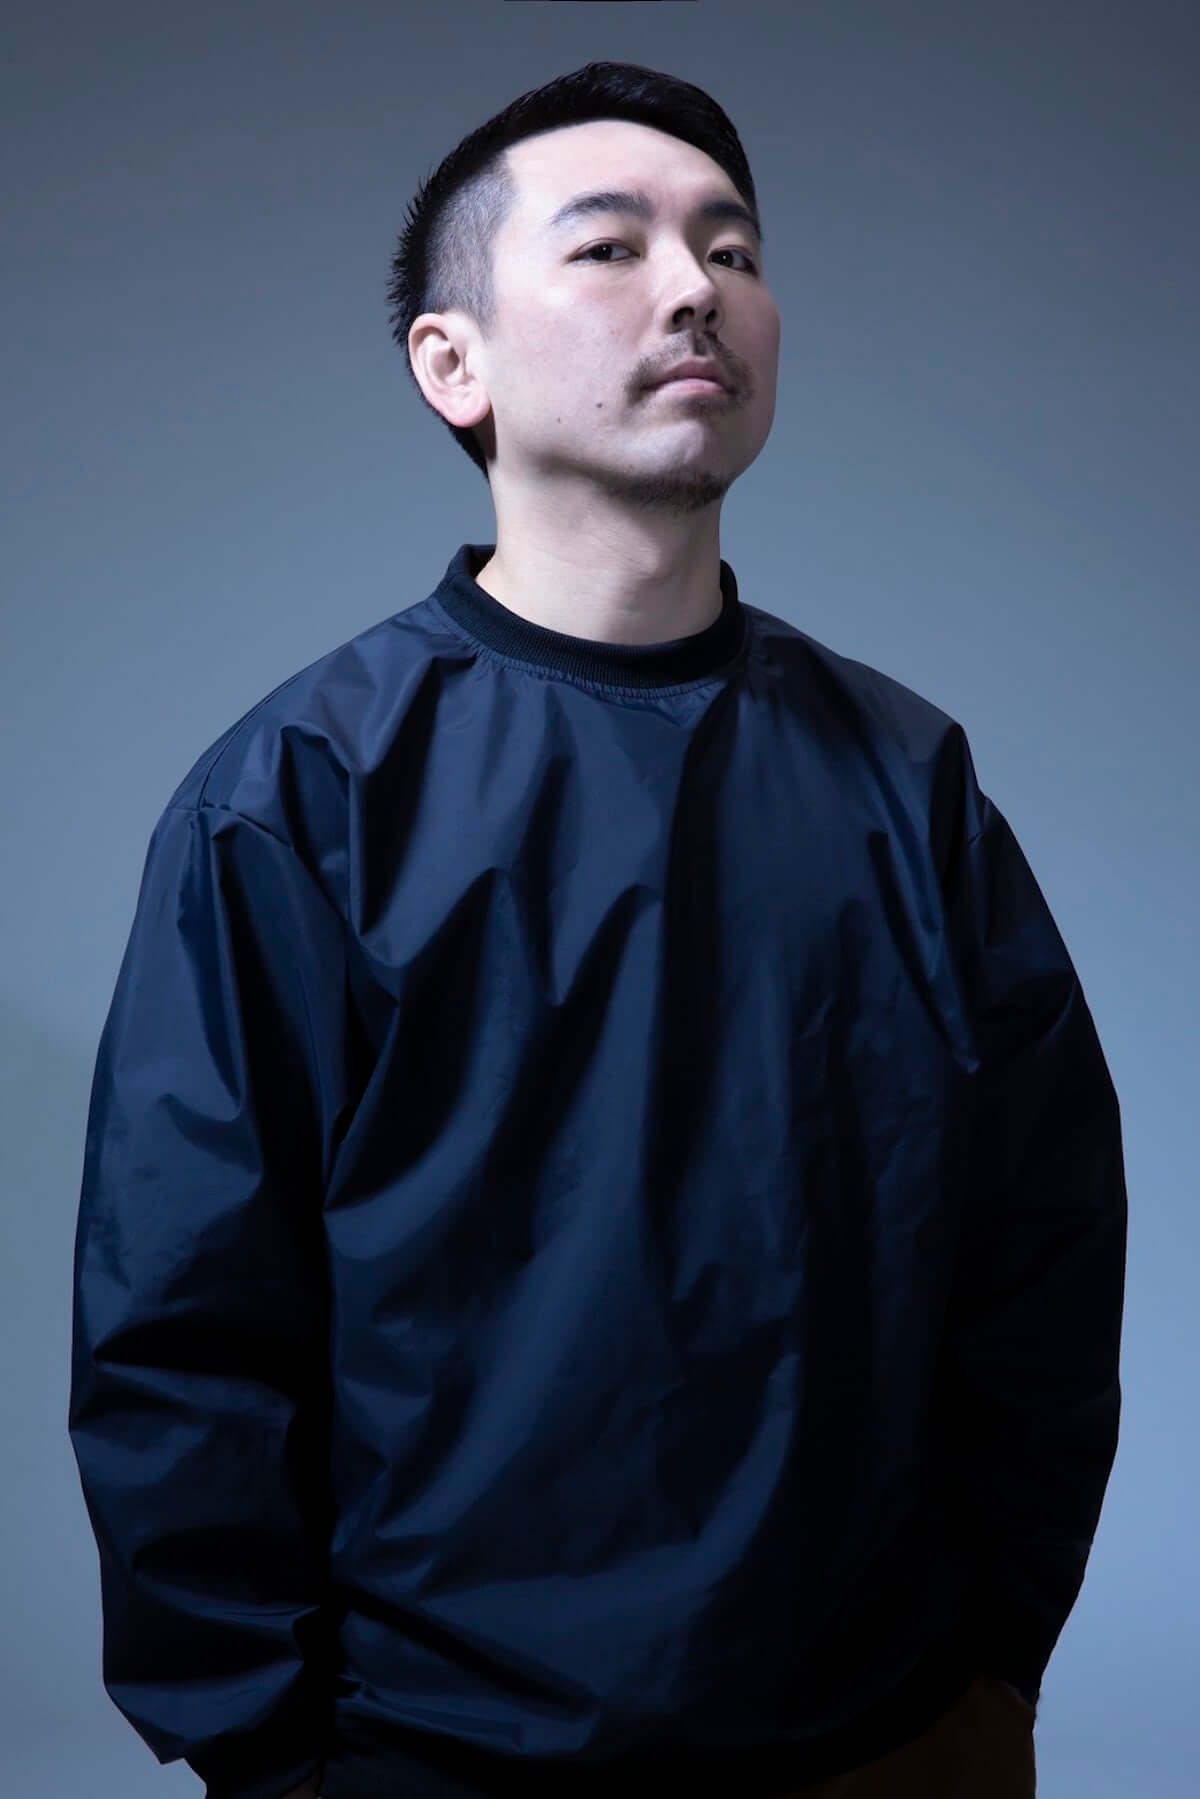 dooooのソロ・アルバム『PANIC』からCreativeDrugStoreのJUBEEを迎えた「Just Another Day」のMVが公開 music190411-doooo-jubee-2-1200x1799